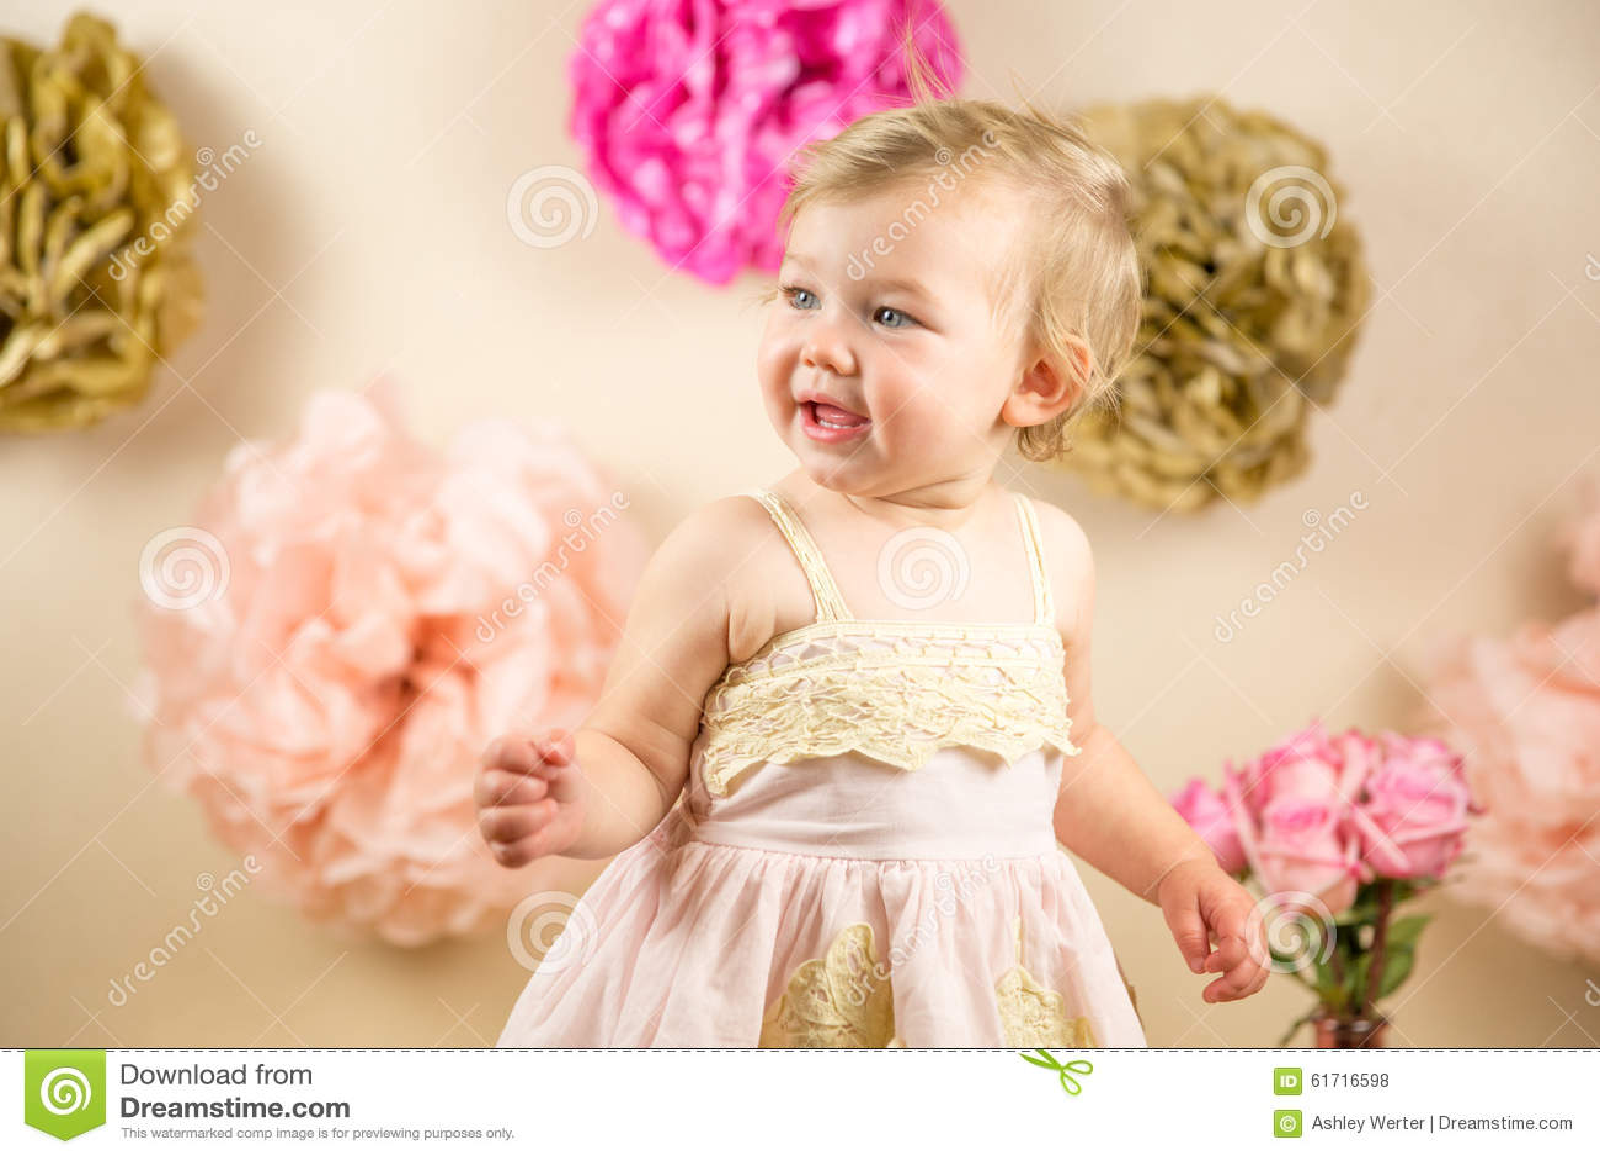 First Birthday Photoshoot Stock Photo Image Of Dress 61716598